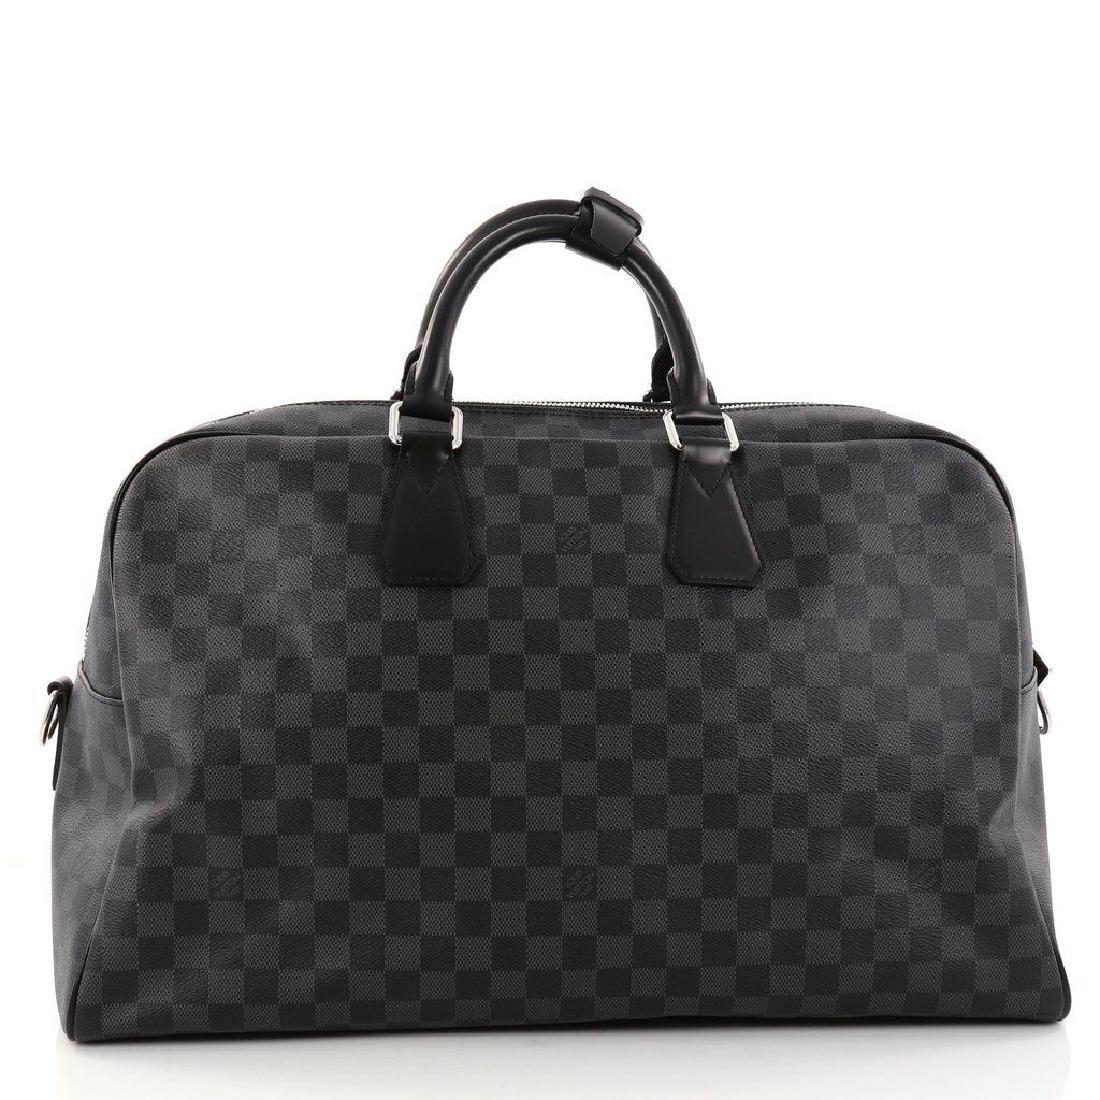 Louis Vuitton Neo Kendall Damier Graphite Duffle - 4